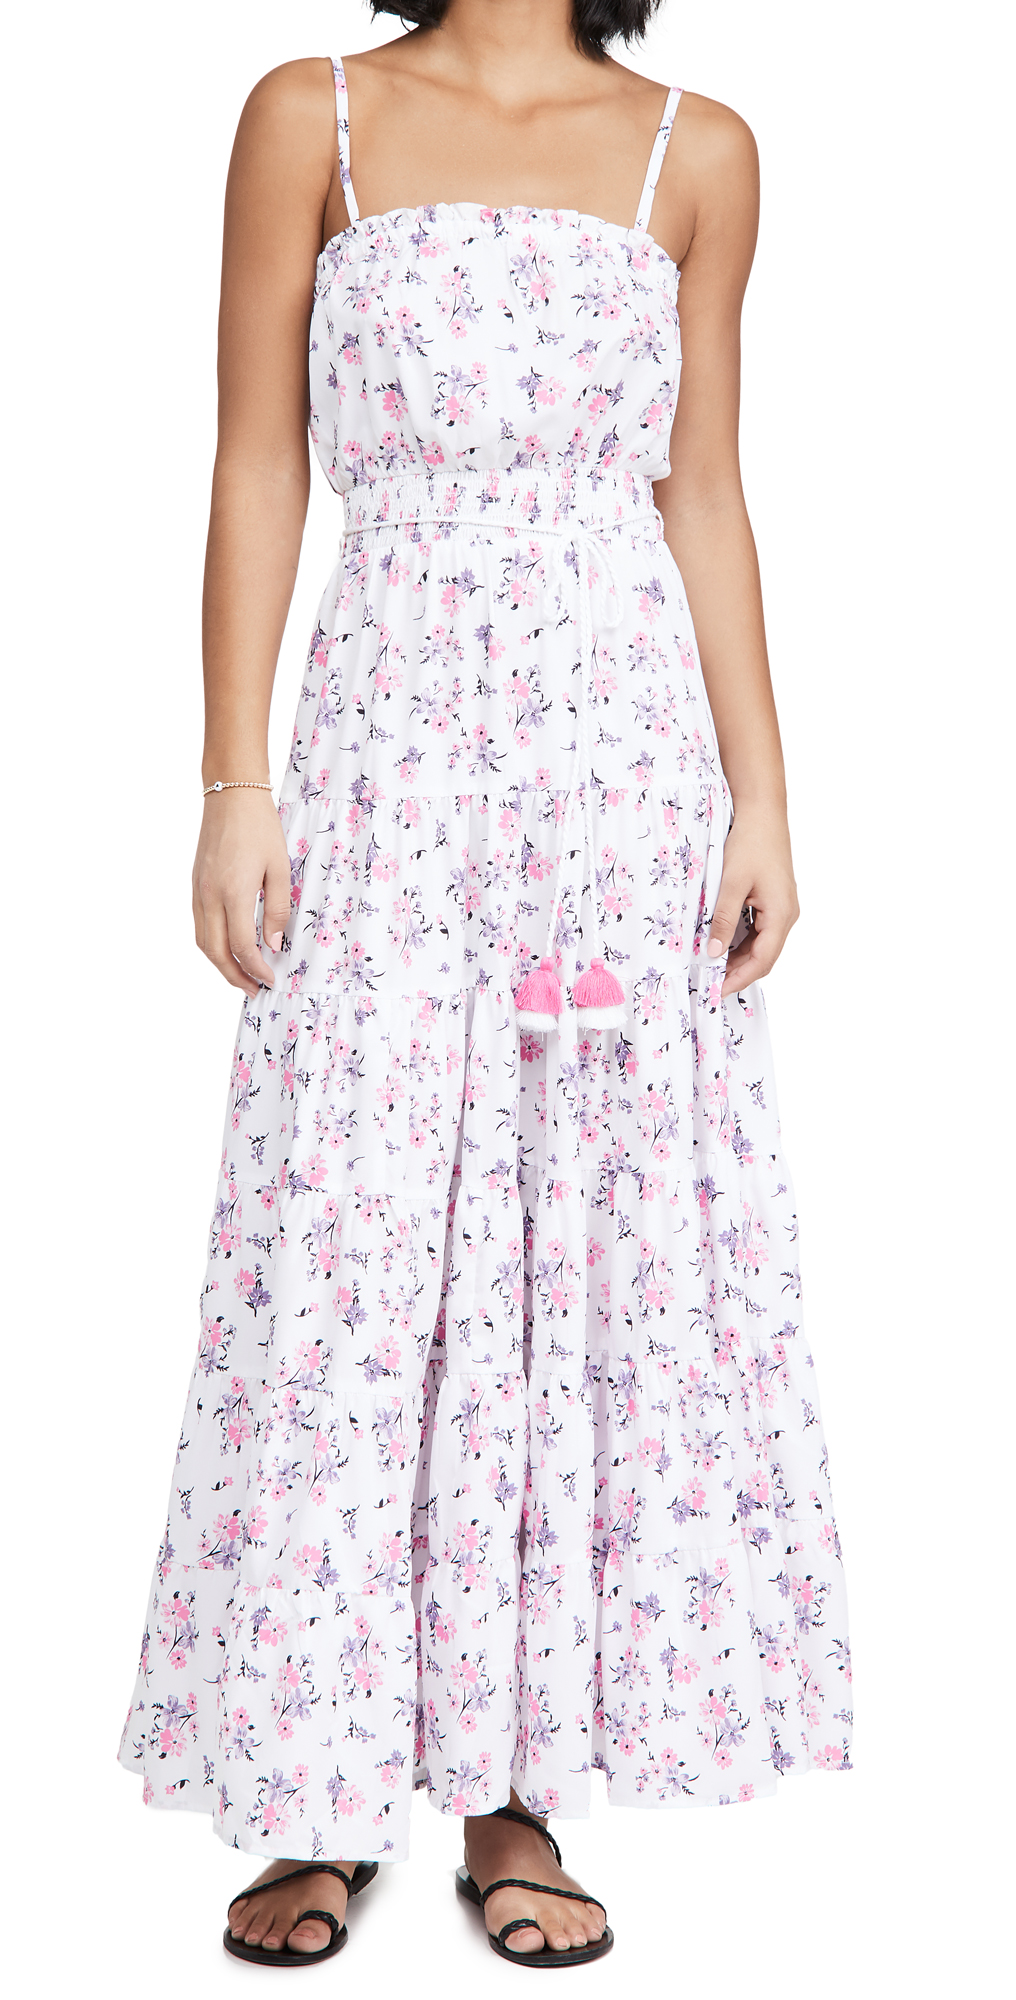 Playa Lucila Tiered Floral Maxi Dress